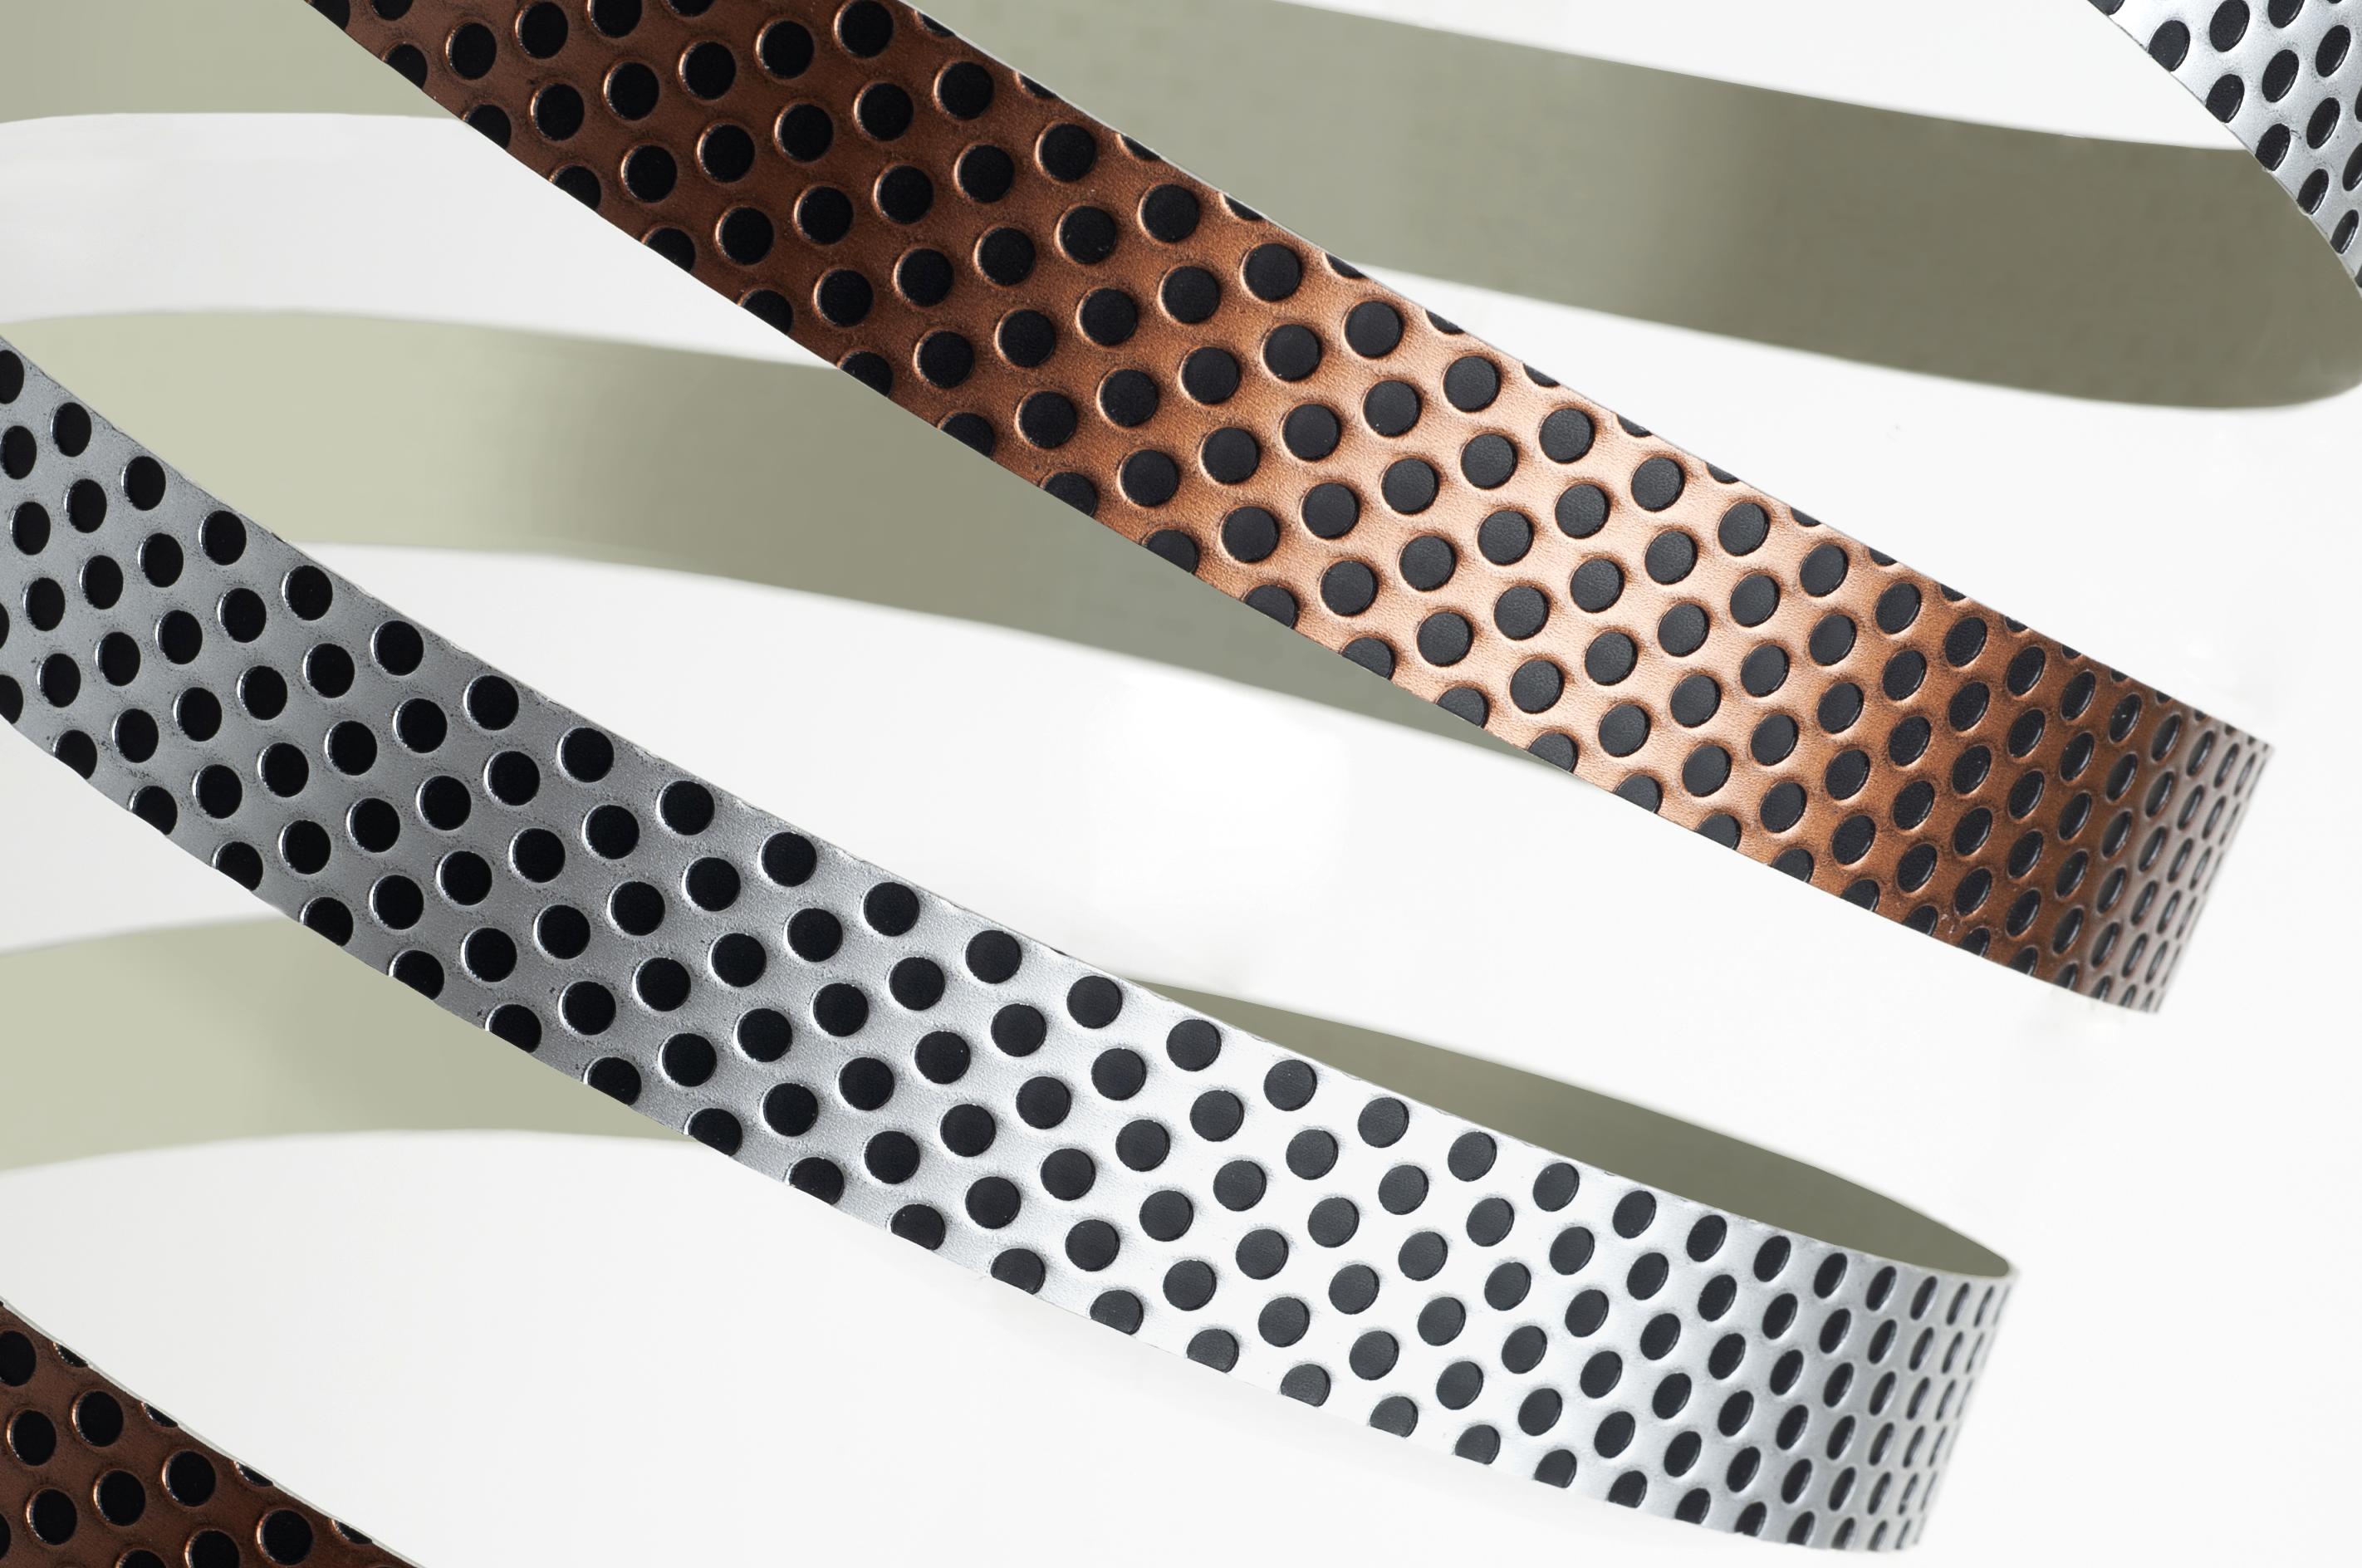 Canto efecto reja - metalizado | Grid effect edgebanding - metallic tones